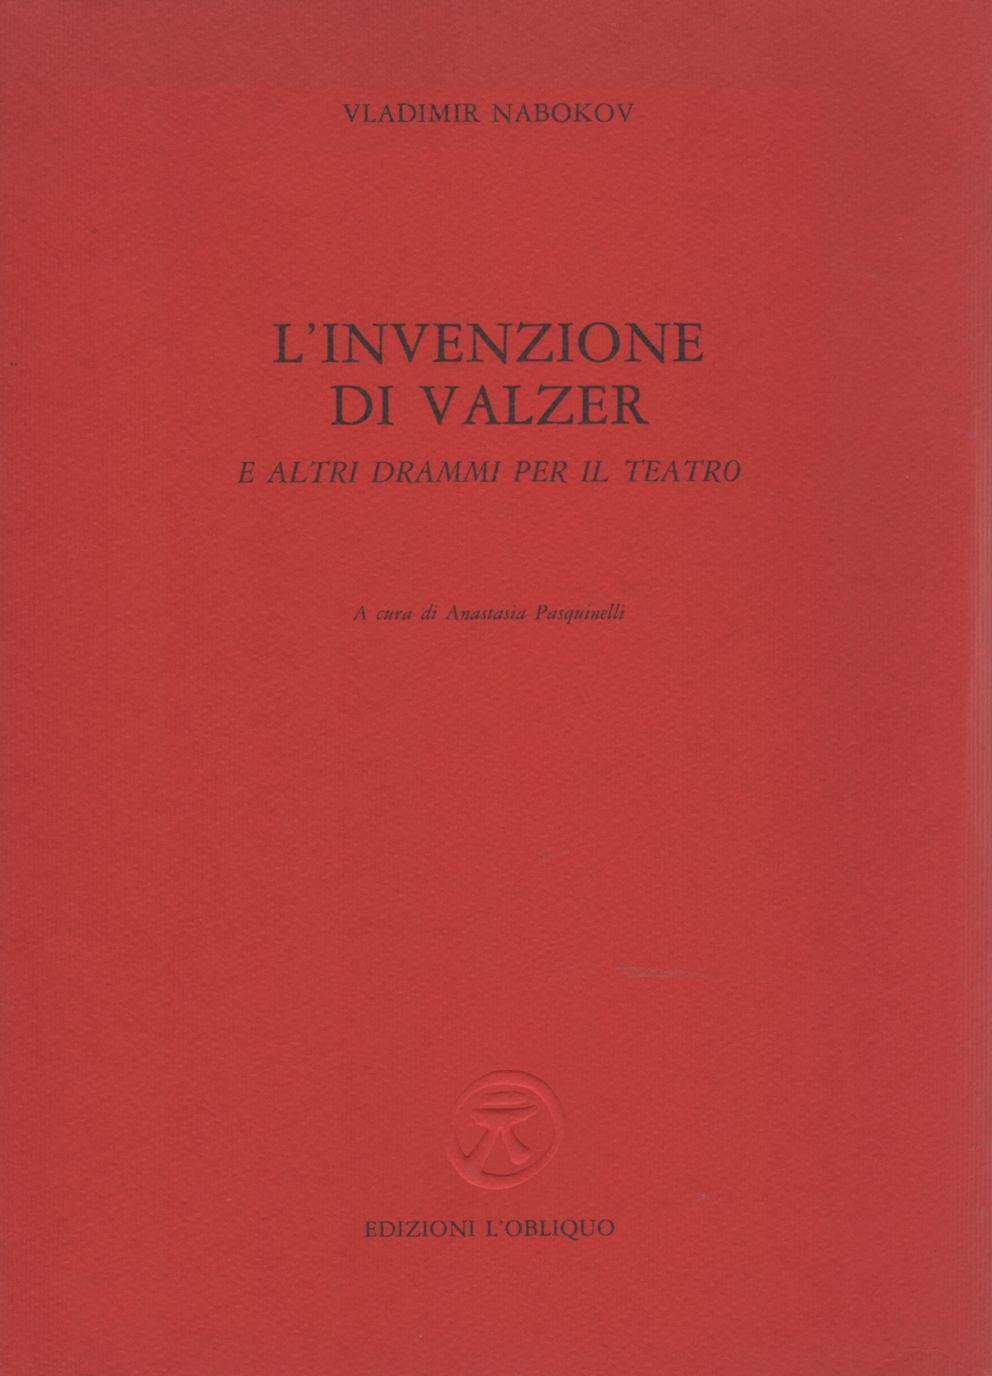 L'invenzione di Valzer